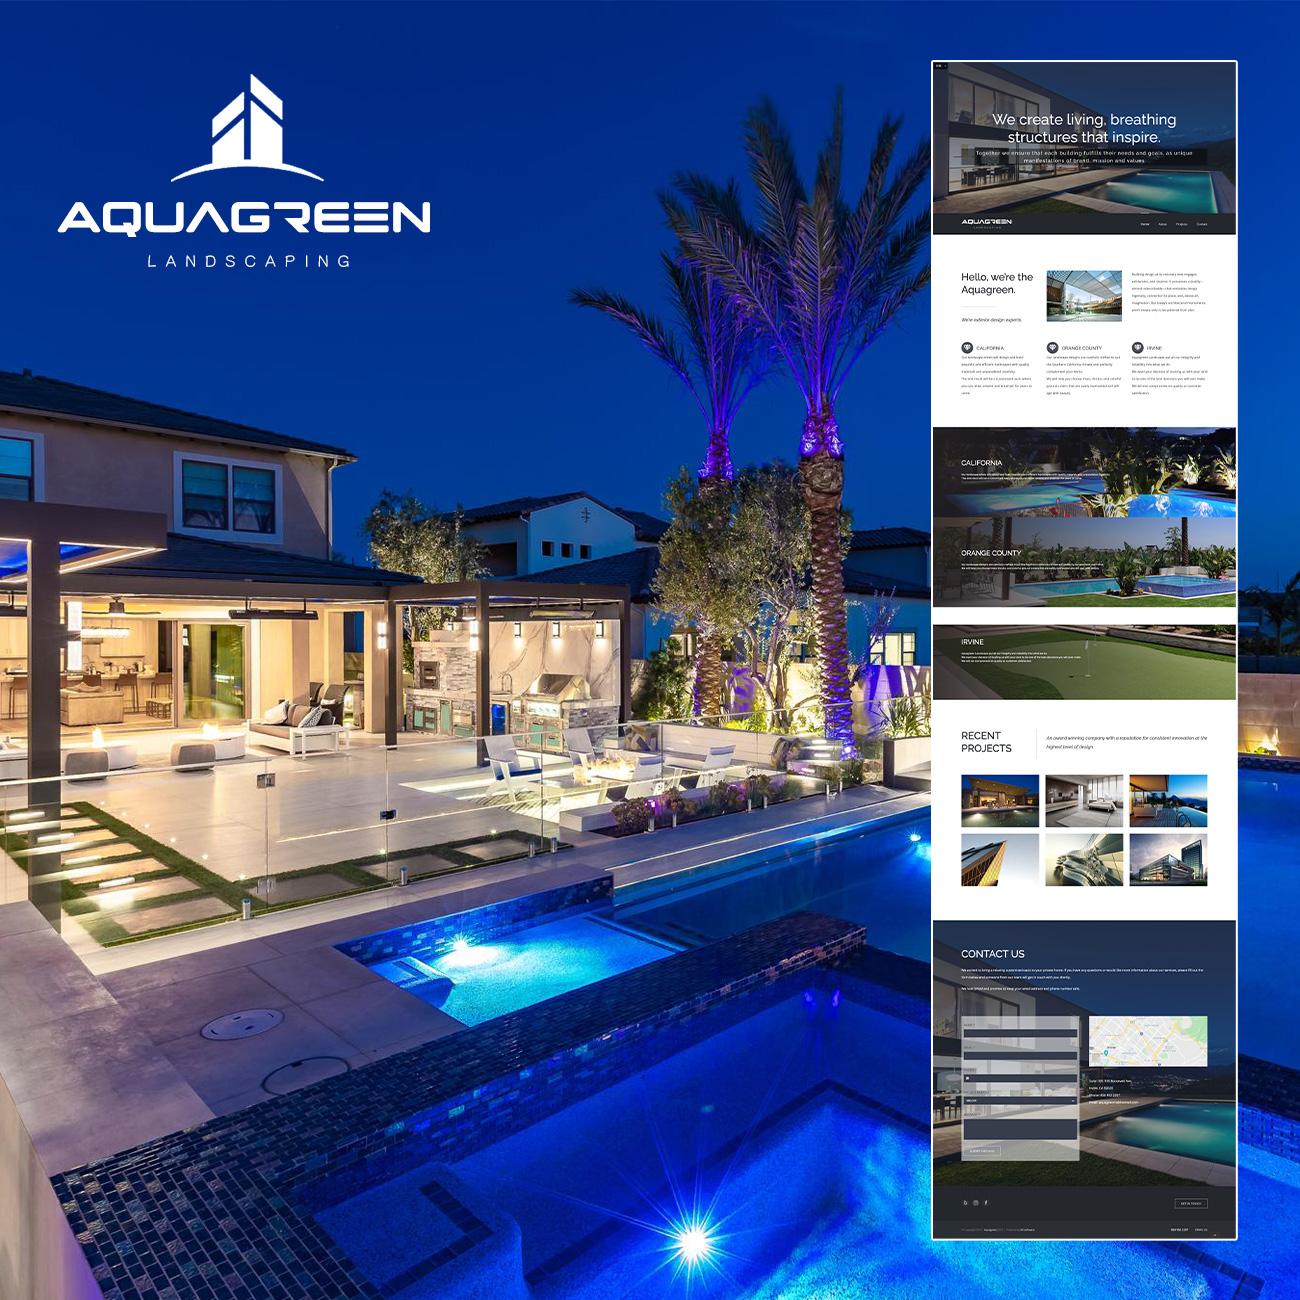 AQUAGREEN Landscaping 公司品牌设计及网站建设